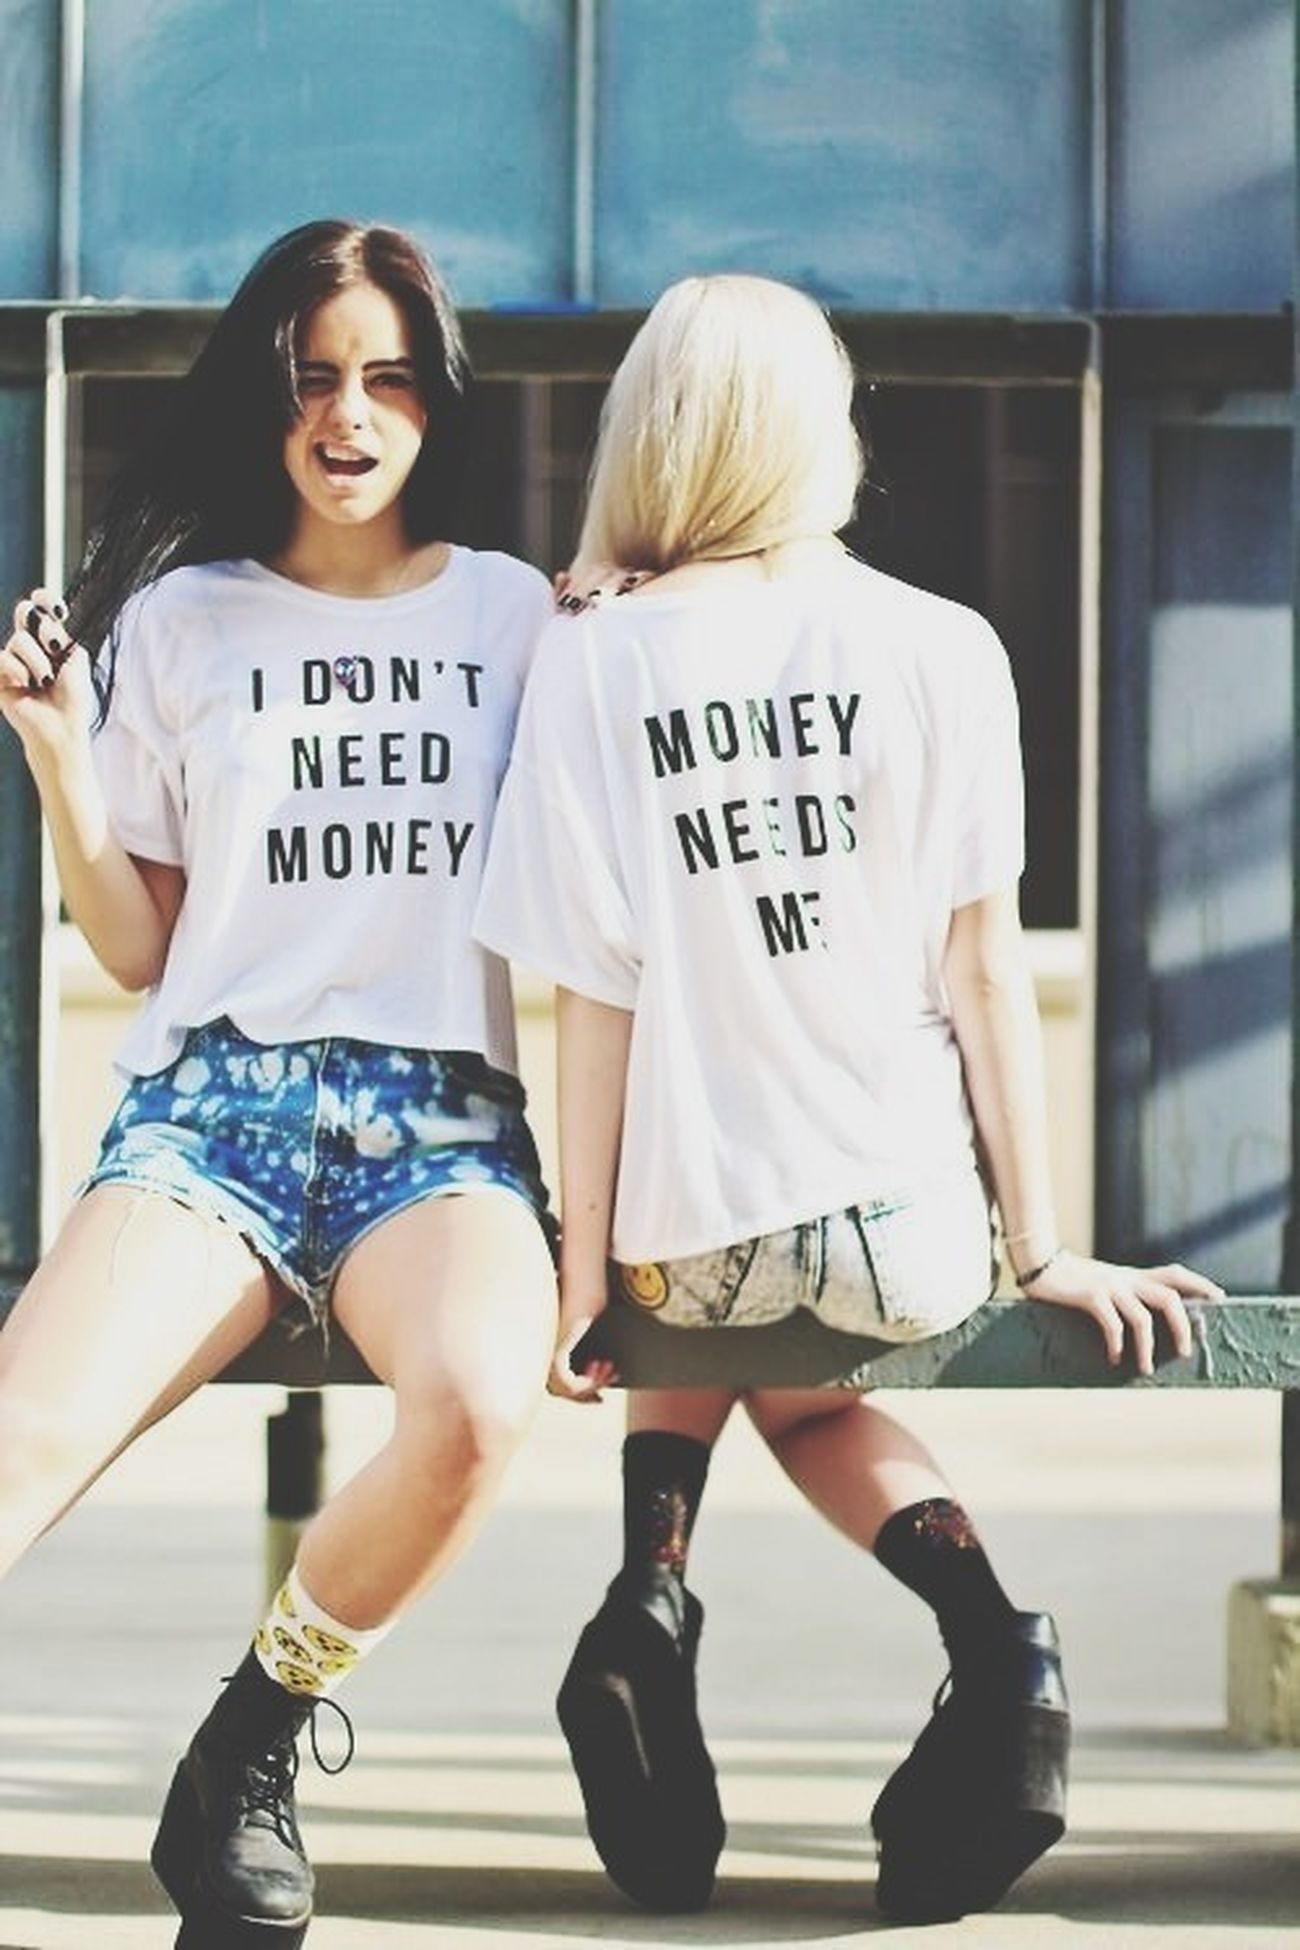 i don't need money, money needs me. Pretty Girl Enjoying Life Dreamer. Don't Need Money